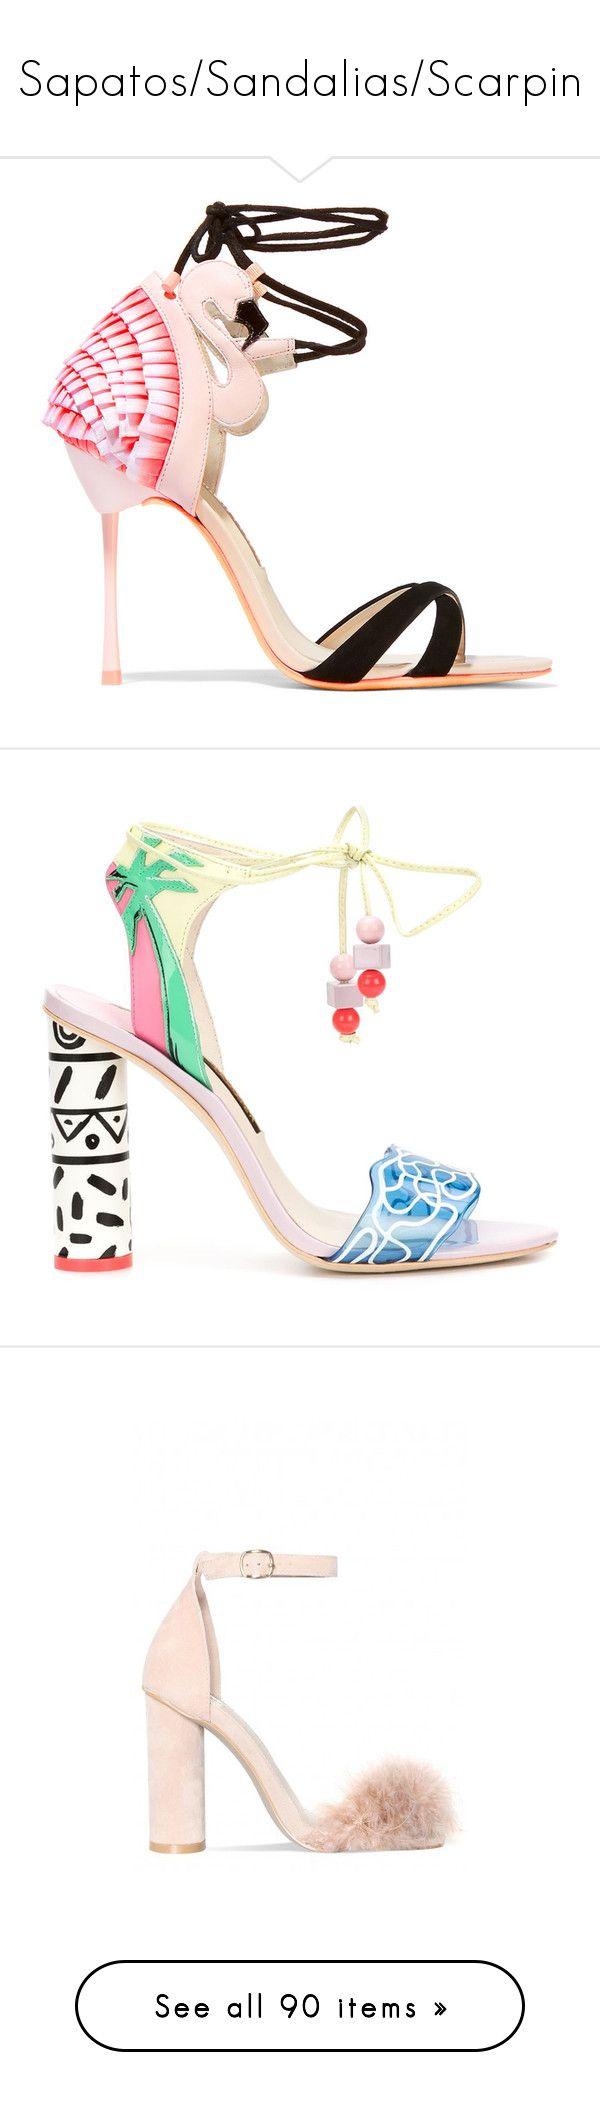 """Sapatos/Sandalias/Scarpin"" by gabriel-sampaiooo on Polyvore featuring shoes, sandals, heels, high heels, sophia webster, pink, strap sandals, pink strappy sandals, strappy high heel sandals e ankle strap heel sandals"